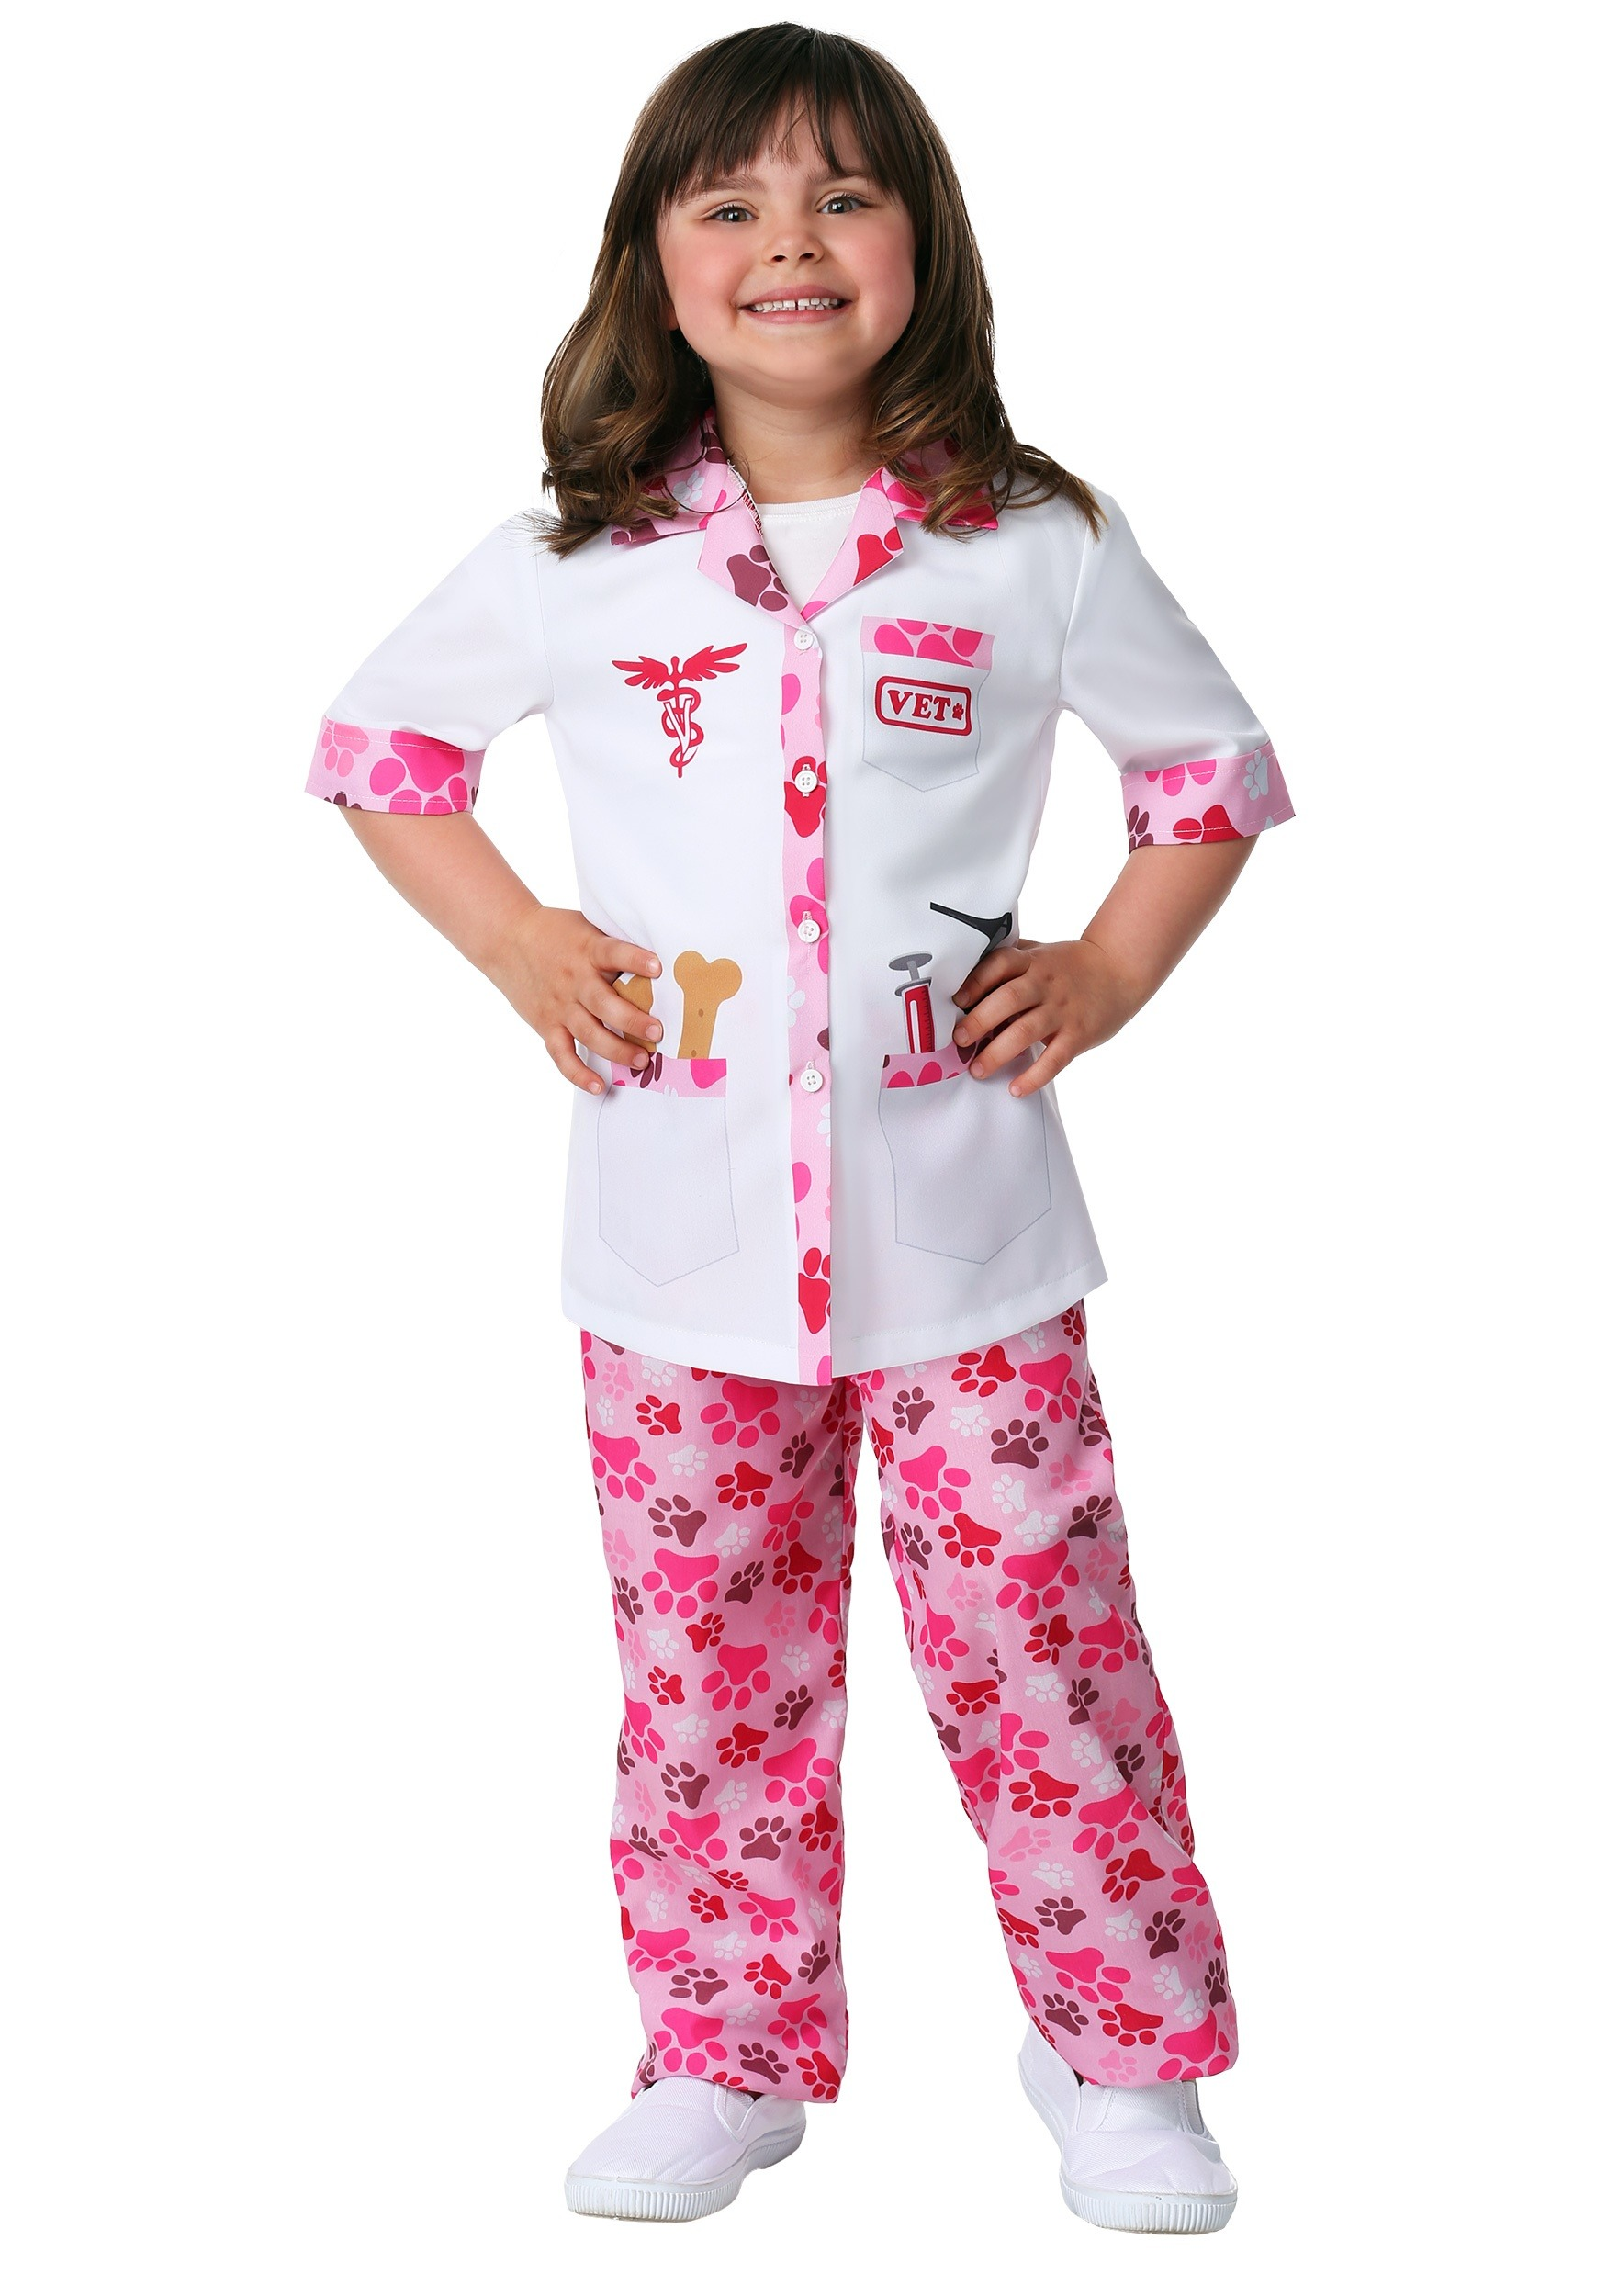 Veterinarian Costume for a Girl